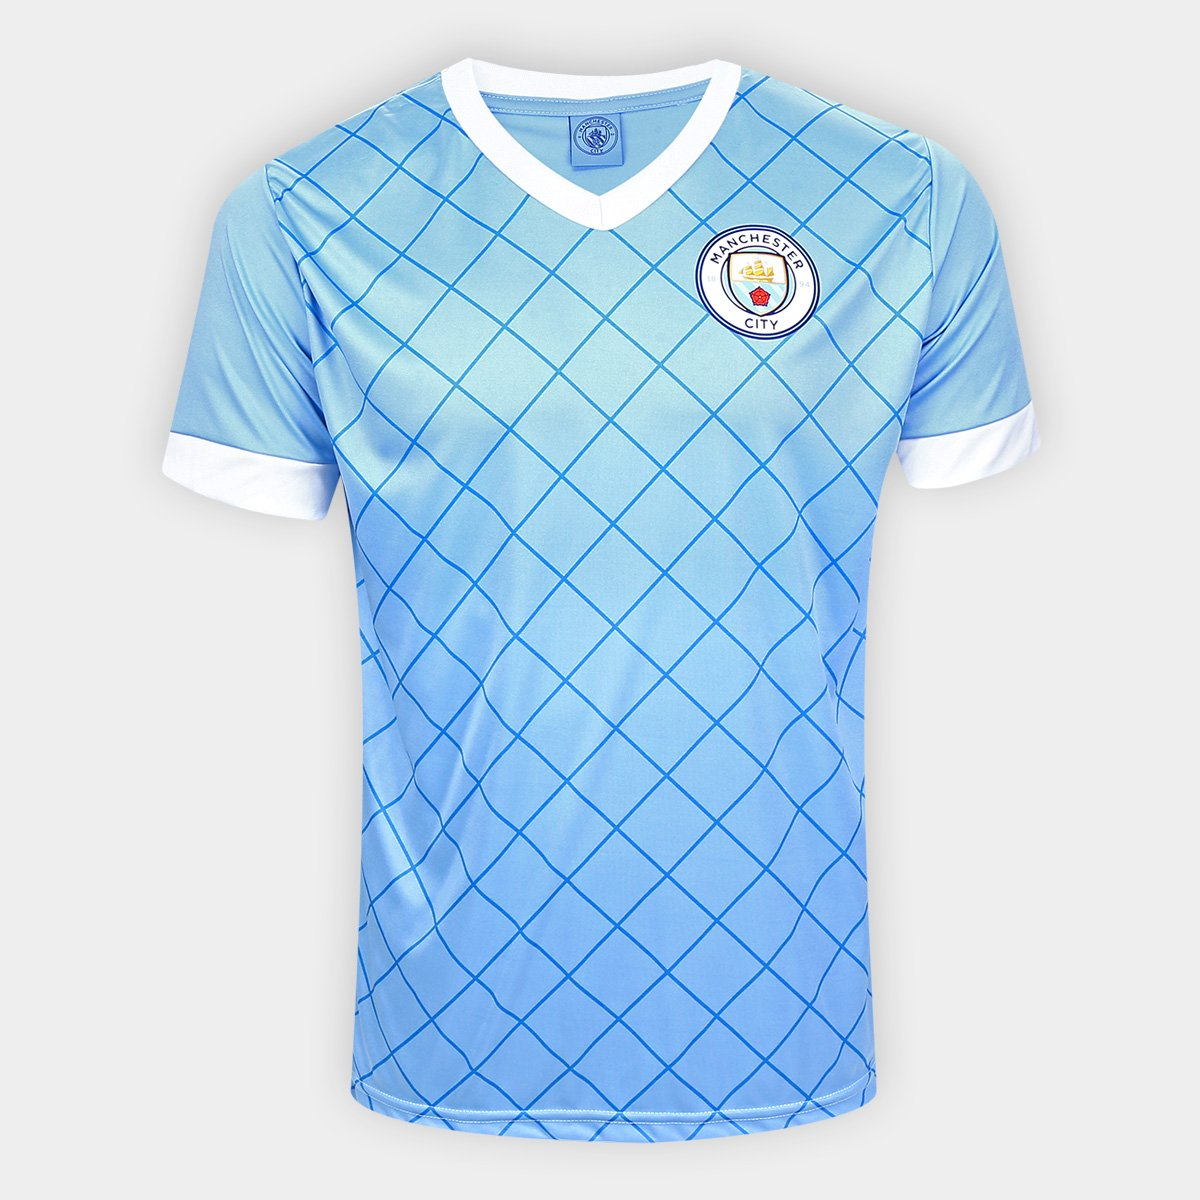 Camisa Manchester City Pattern Spr Sports Masculino